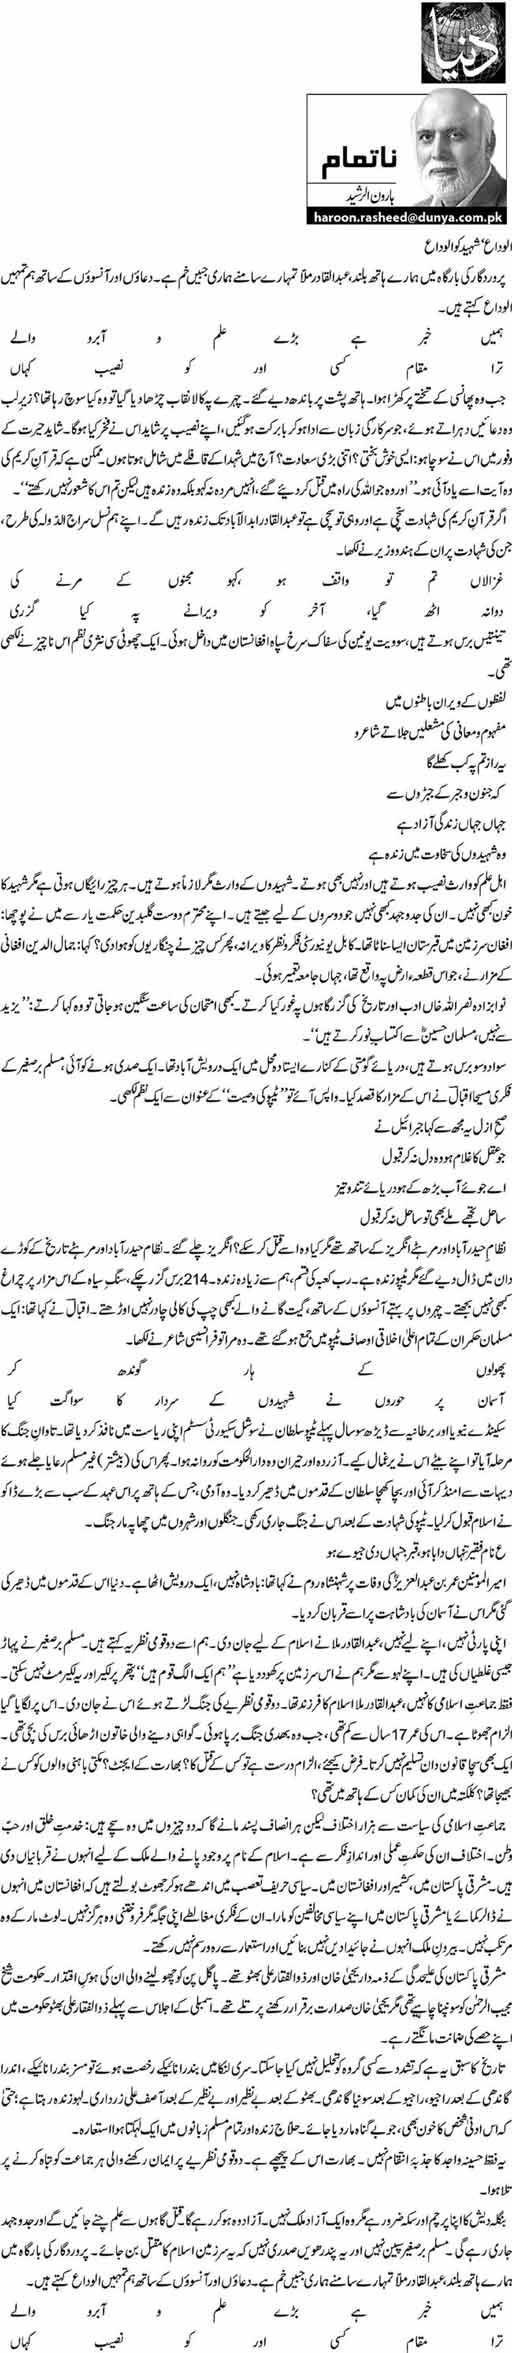 Alvida Shaheed Ko Alvida - Haroon-ur-Rasheed